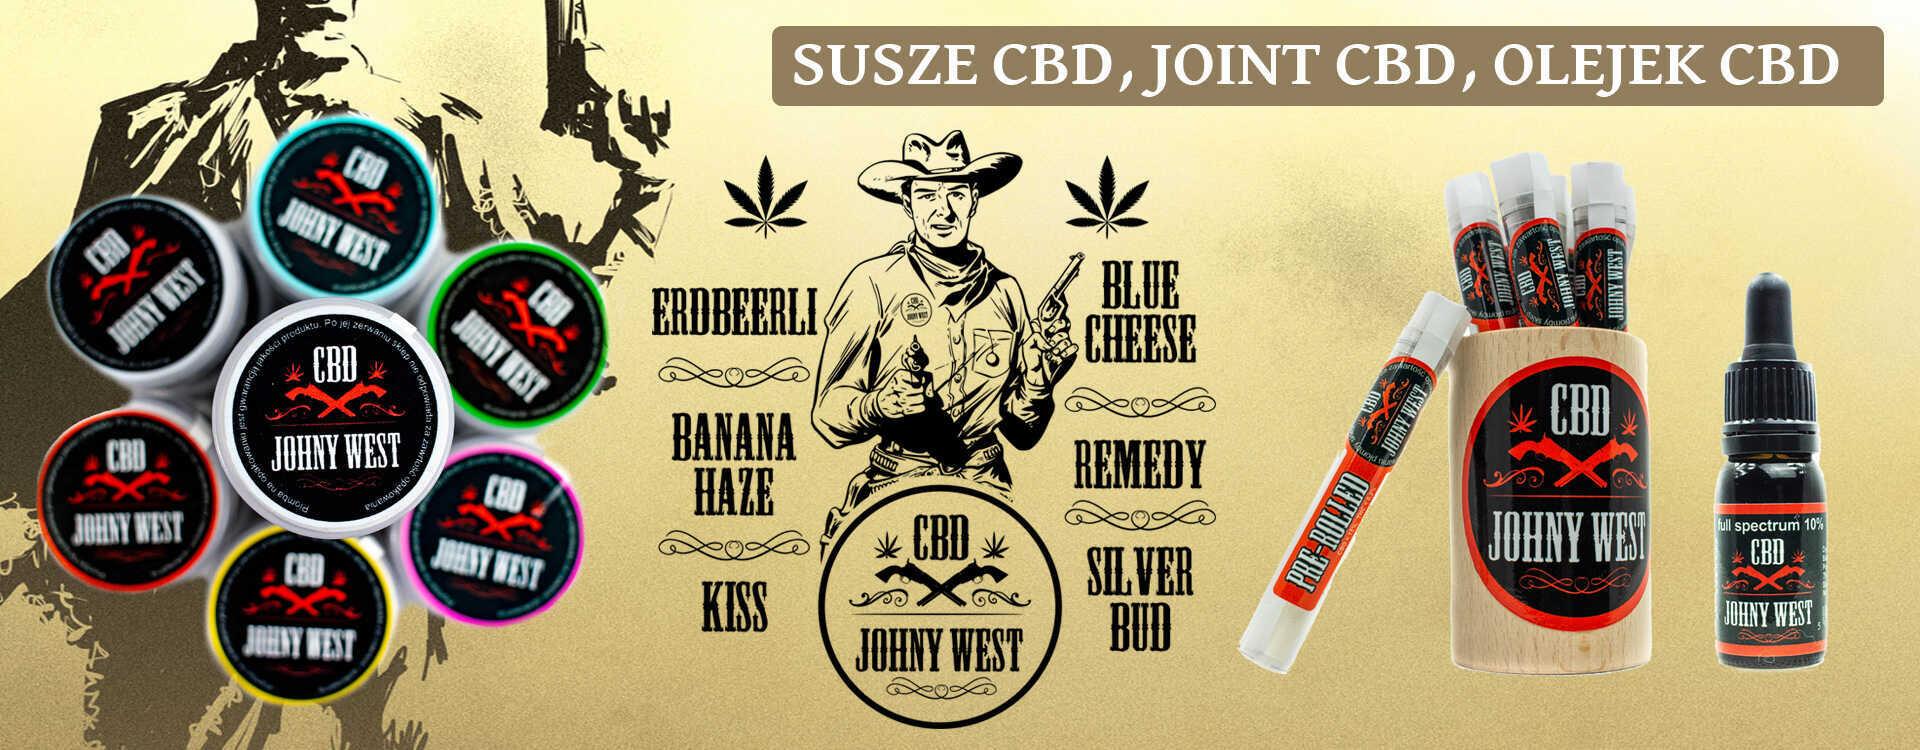 CBD Johny West